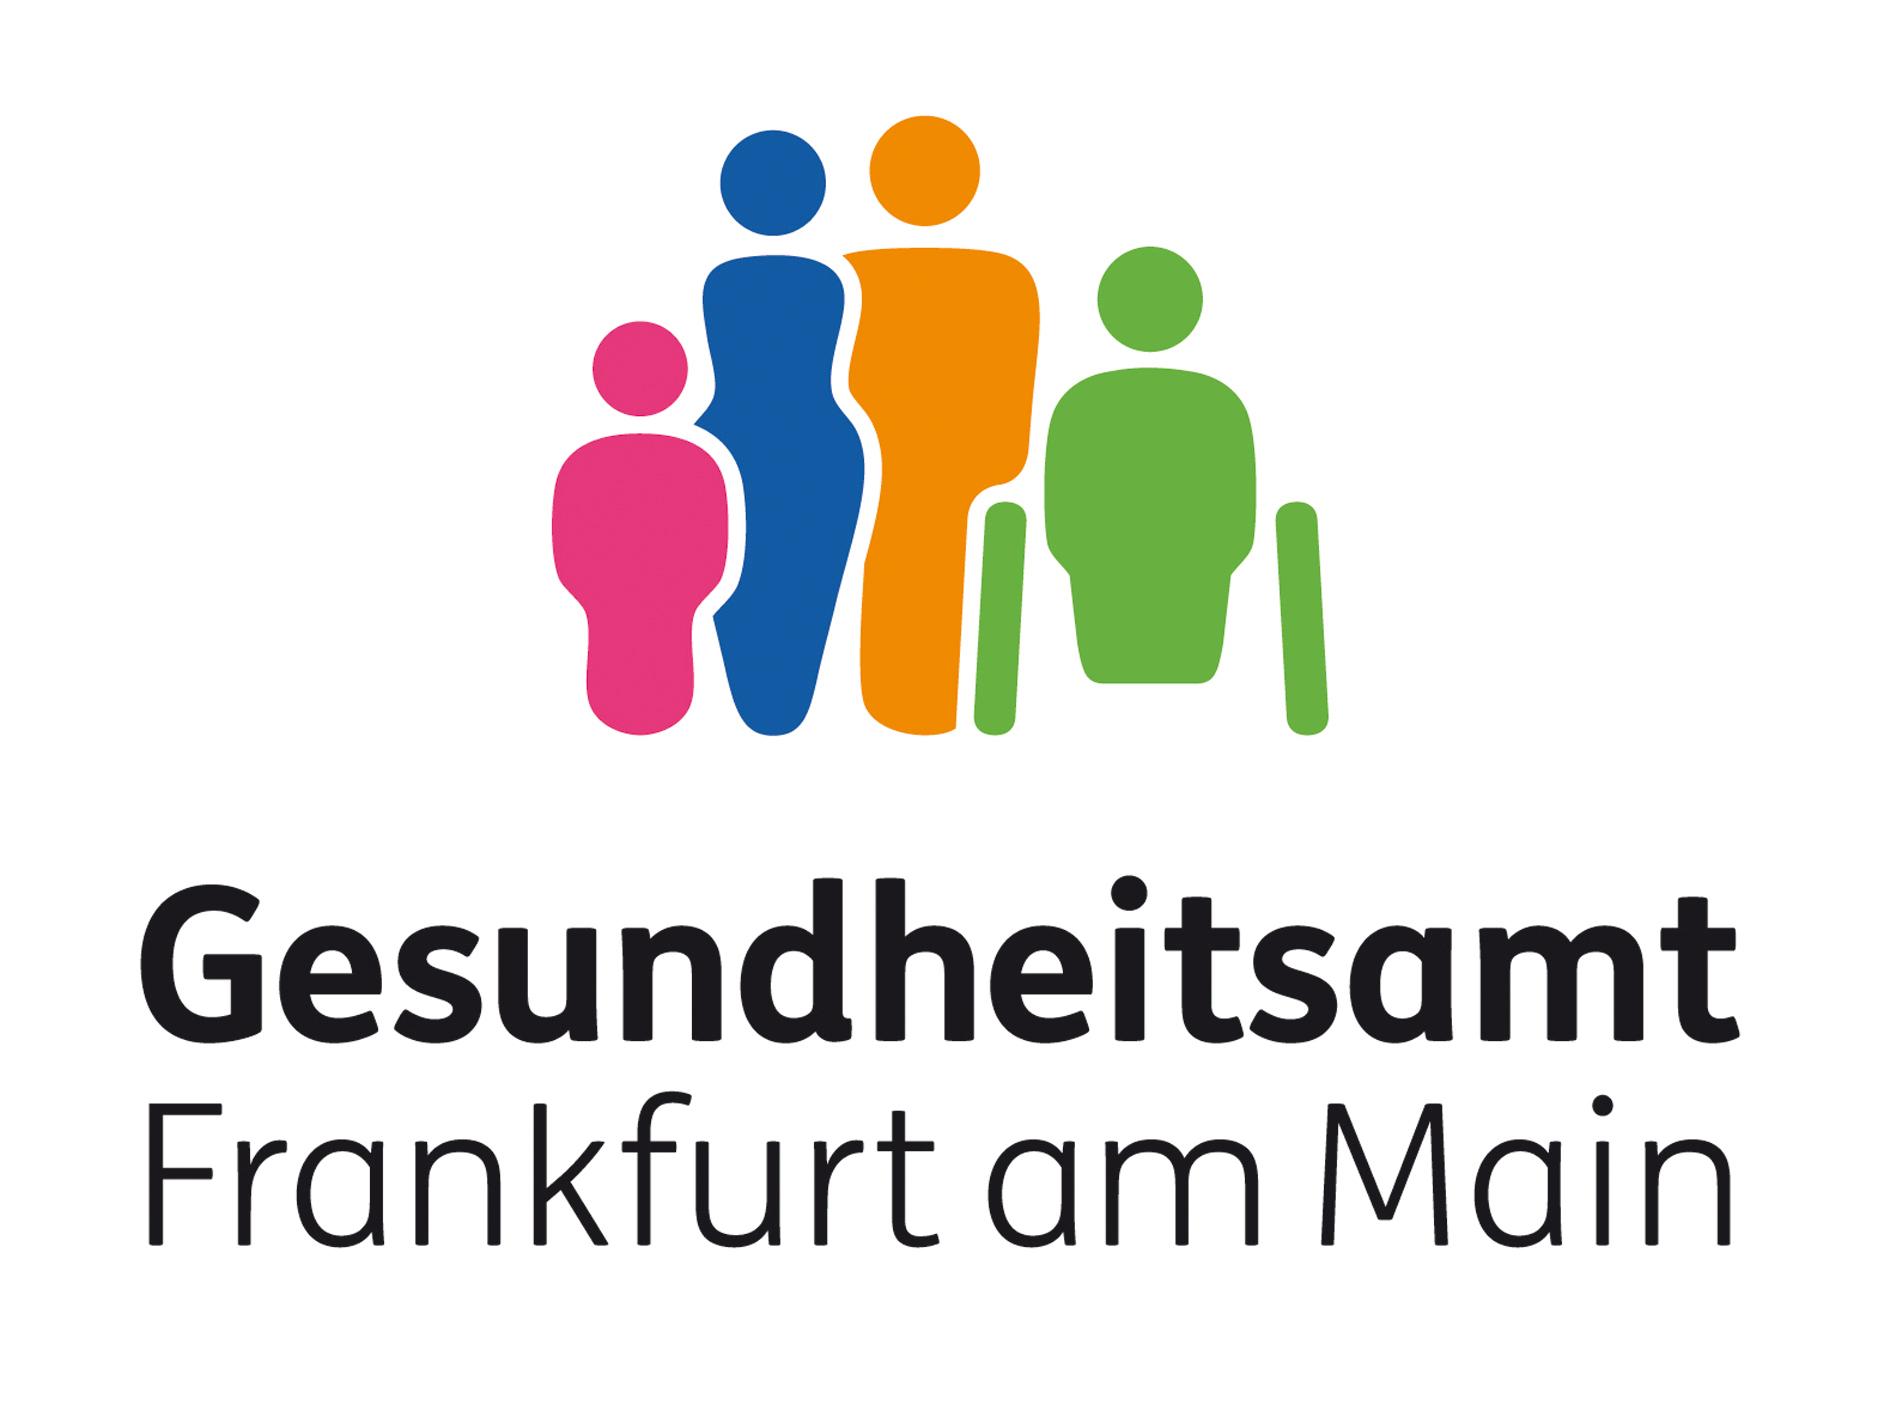 Gesunheitsamt Frankfurt am Main